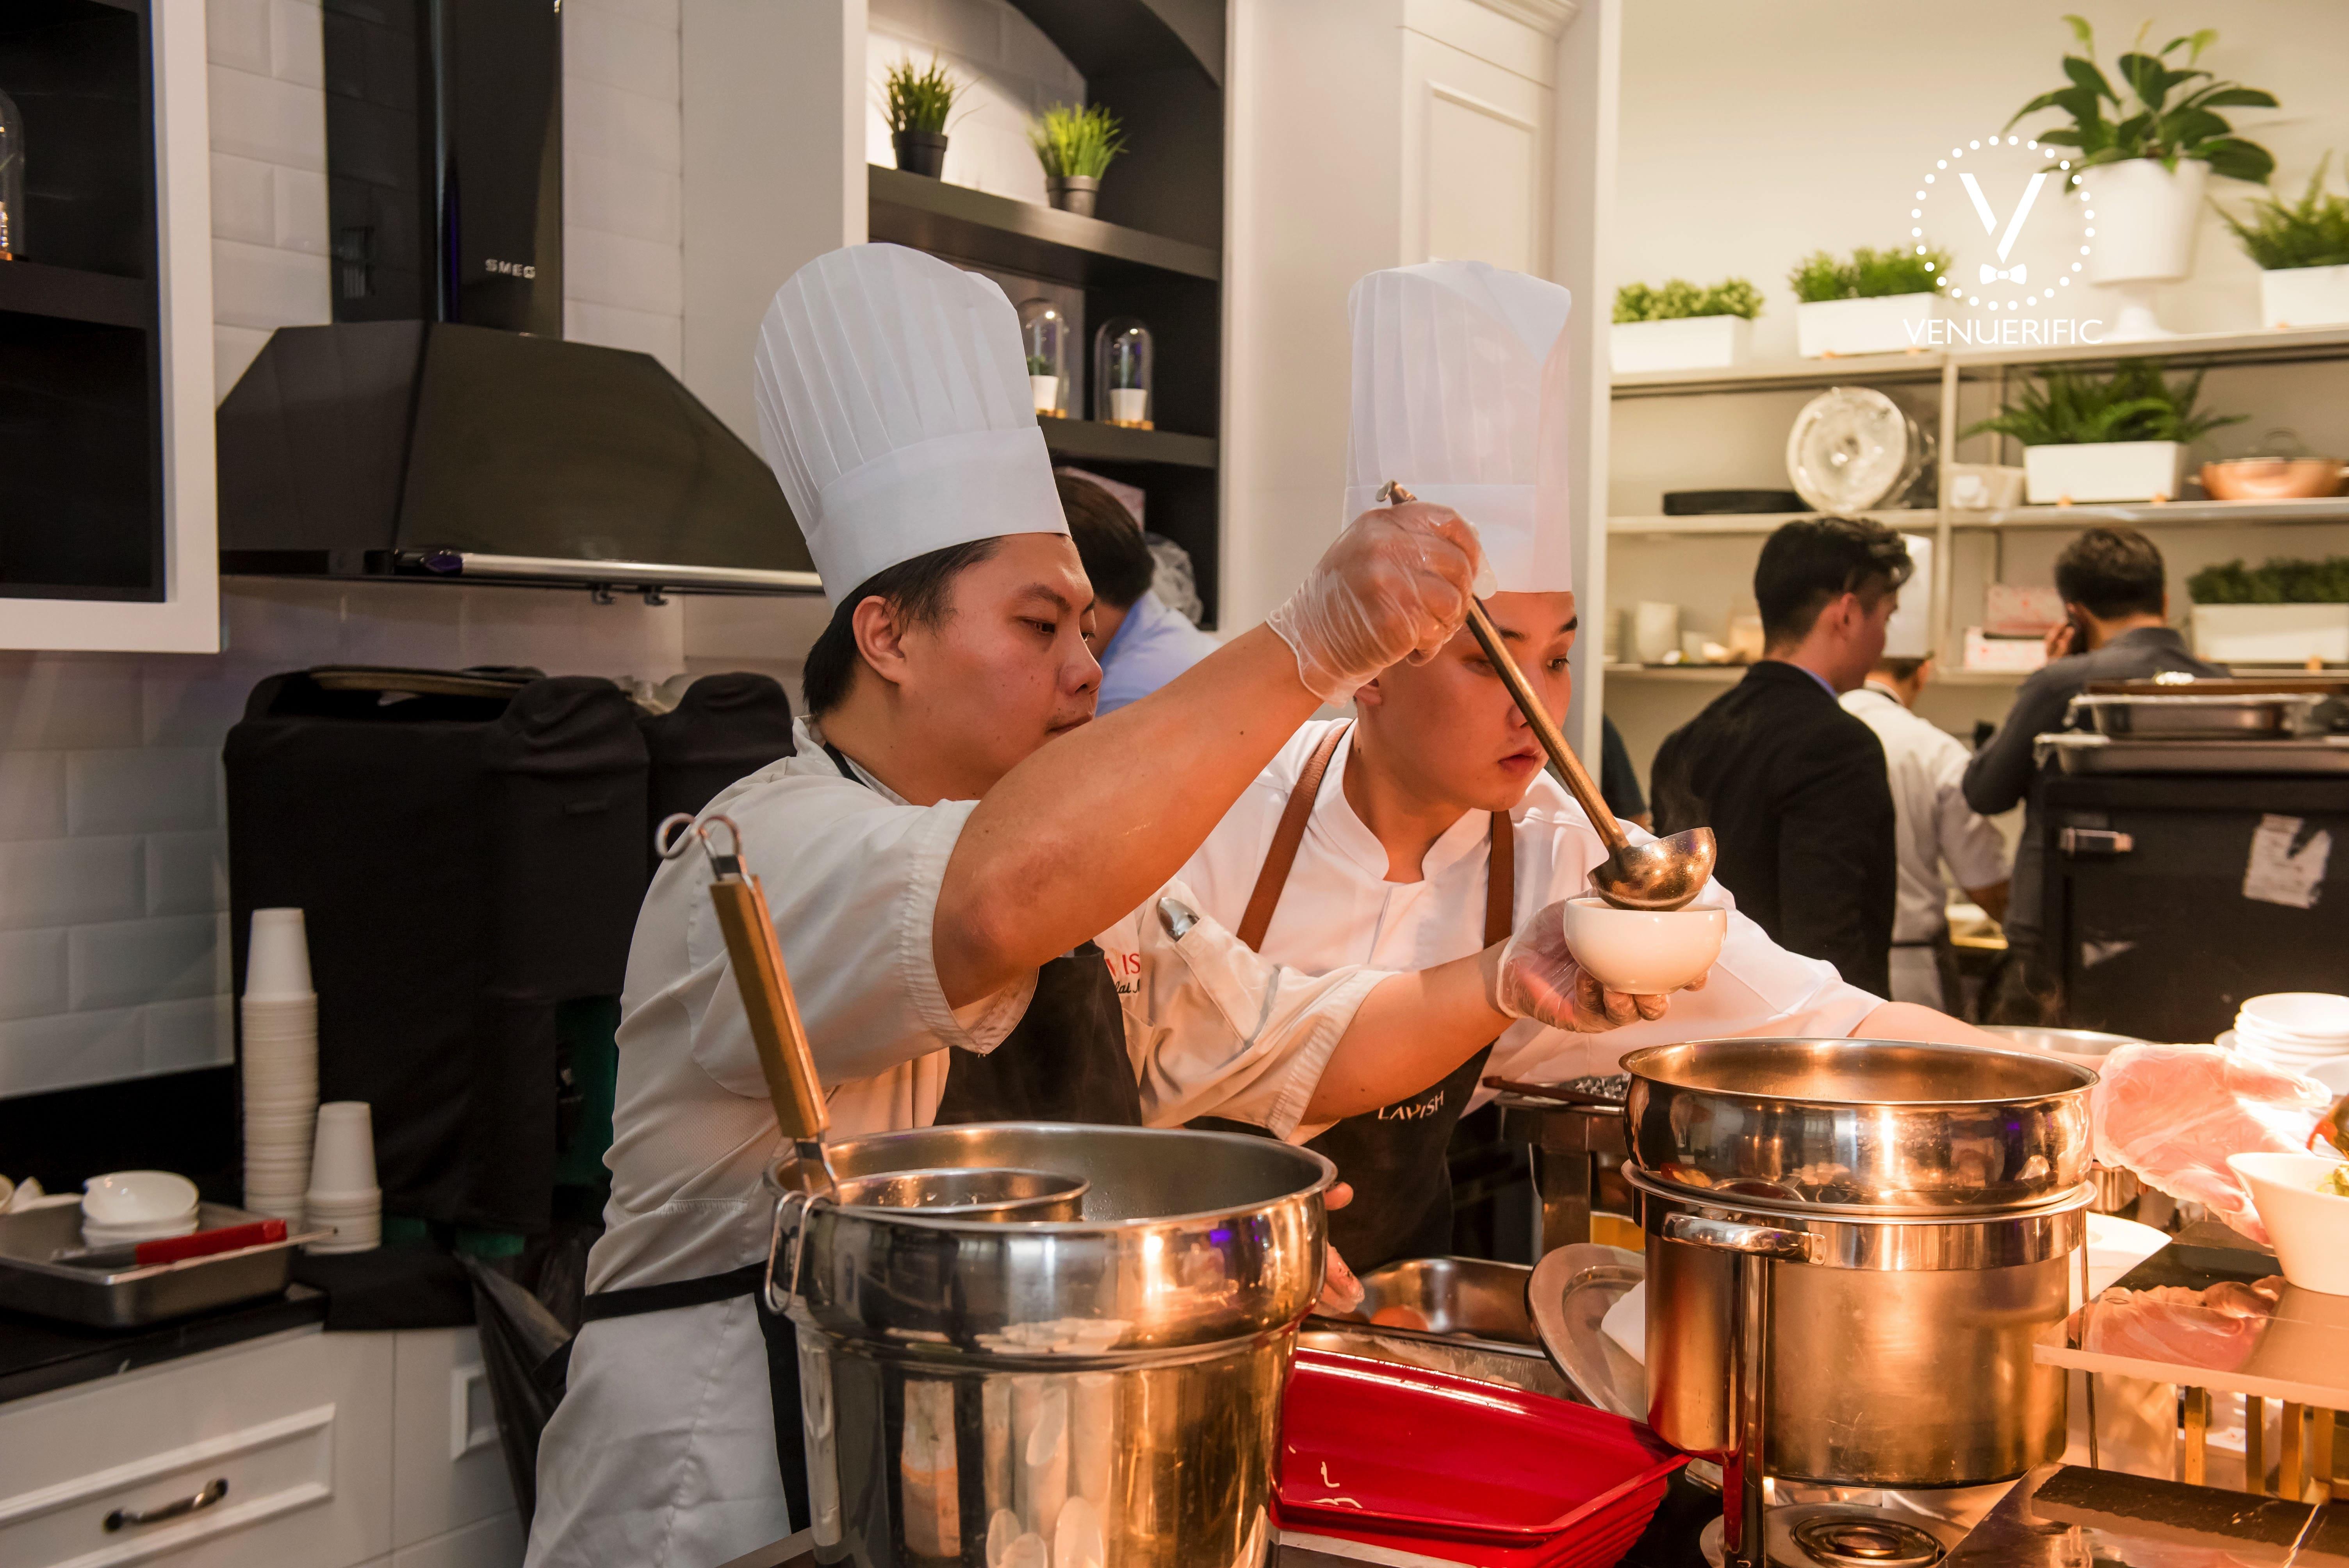 venuerific-blog-6th-anniversary-party-lavish-catering